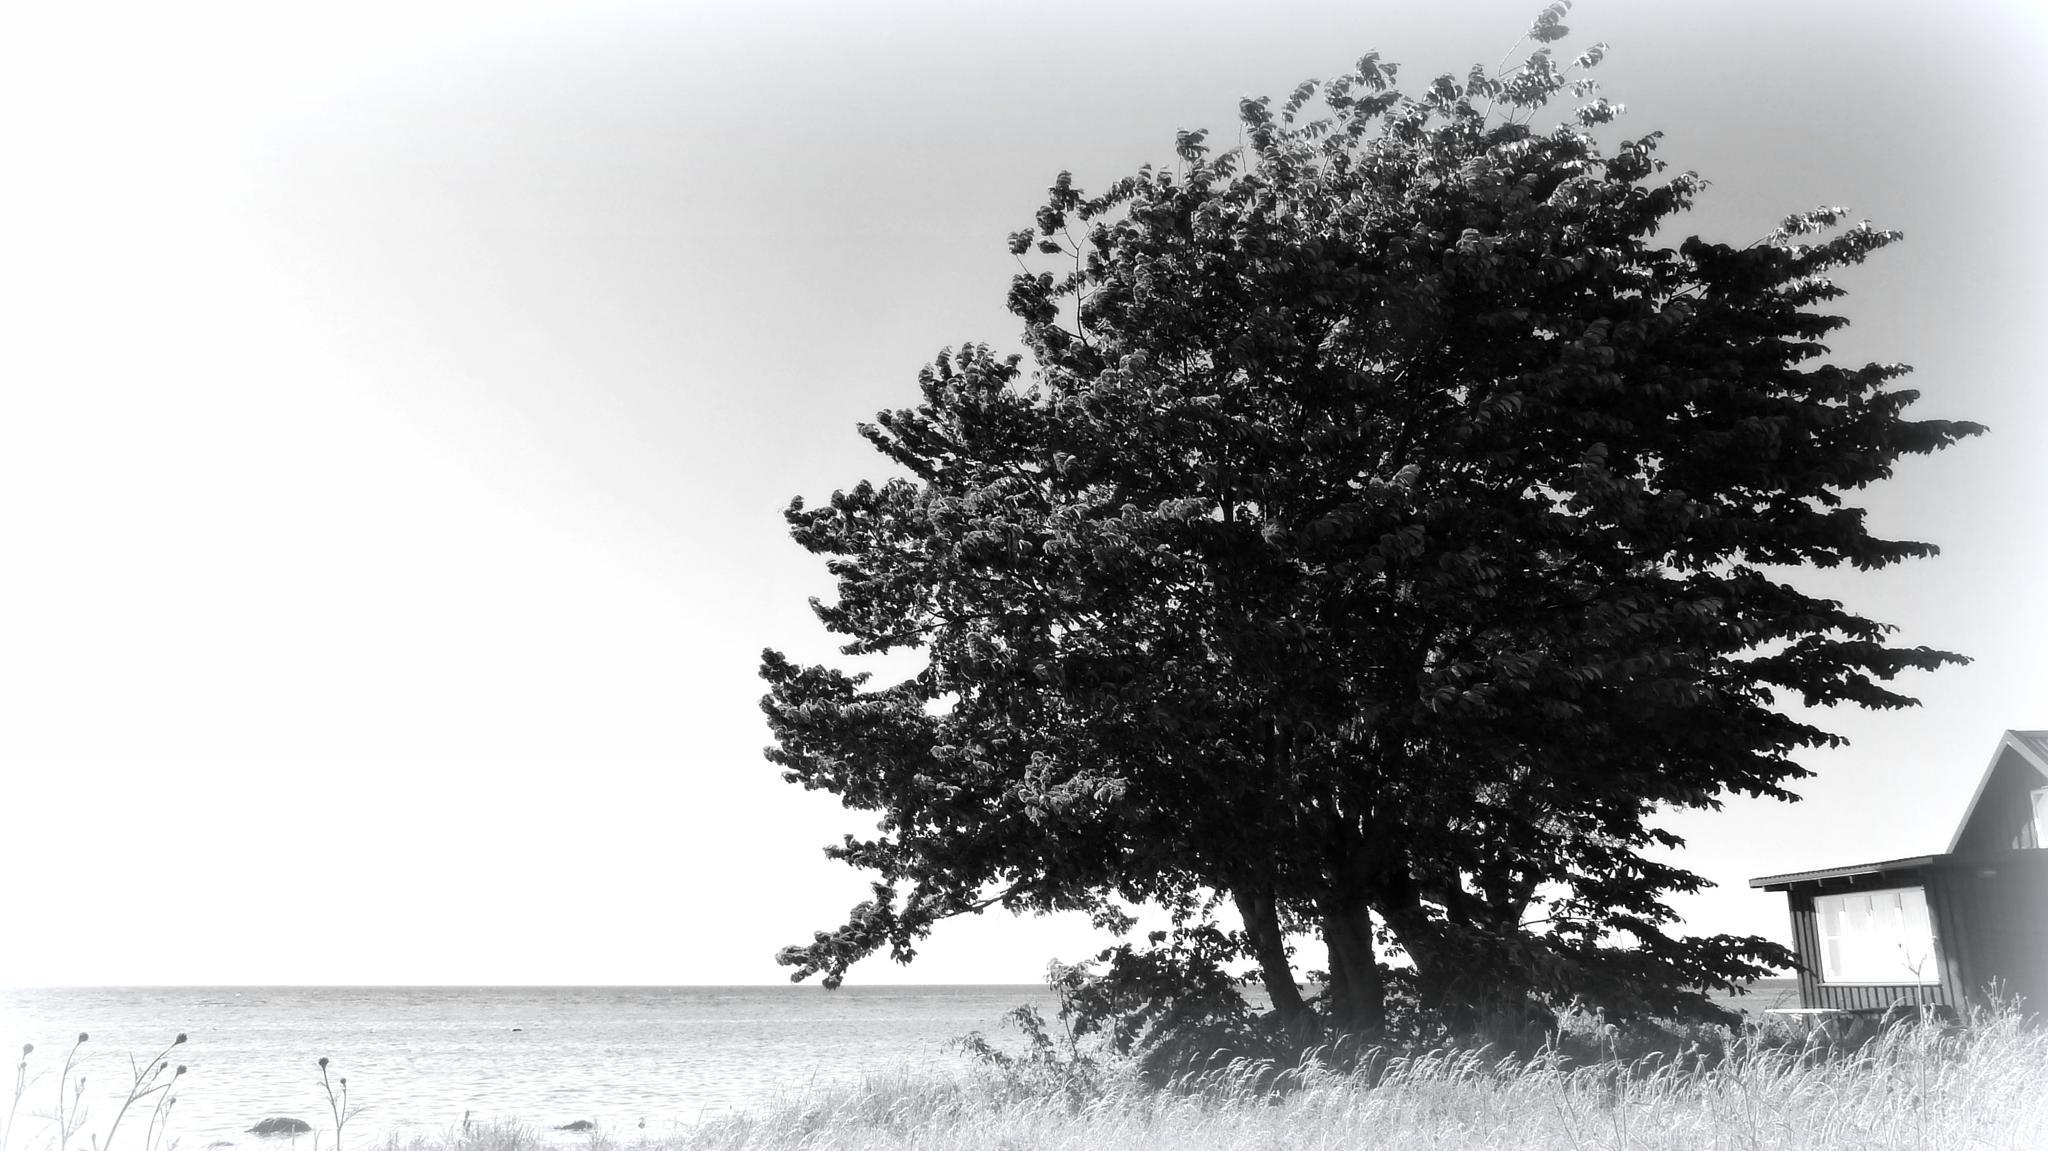 Sunlight in black and white by maja.e.olin